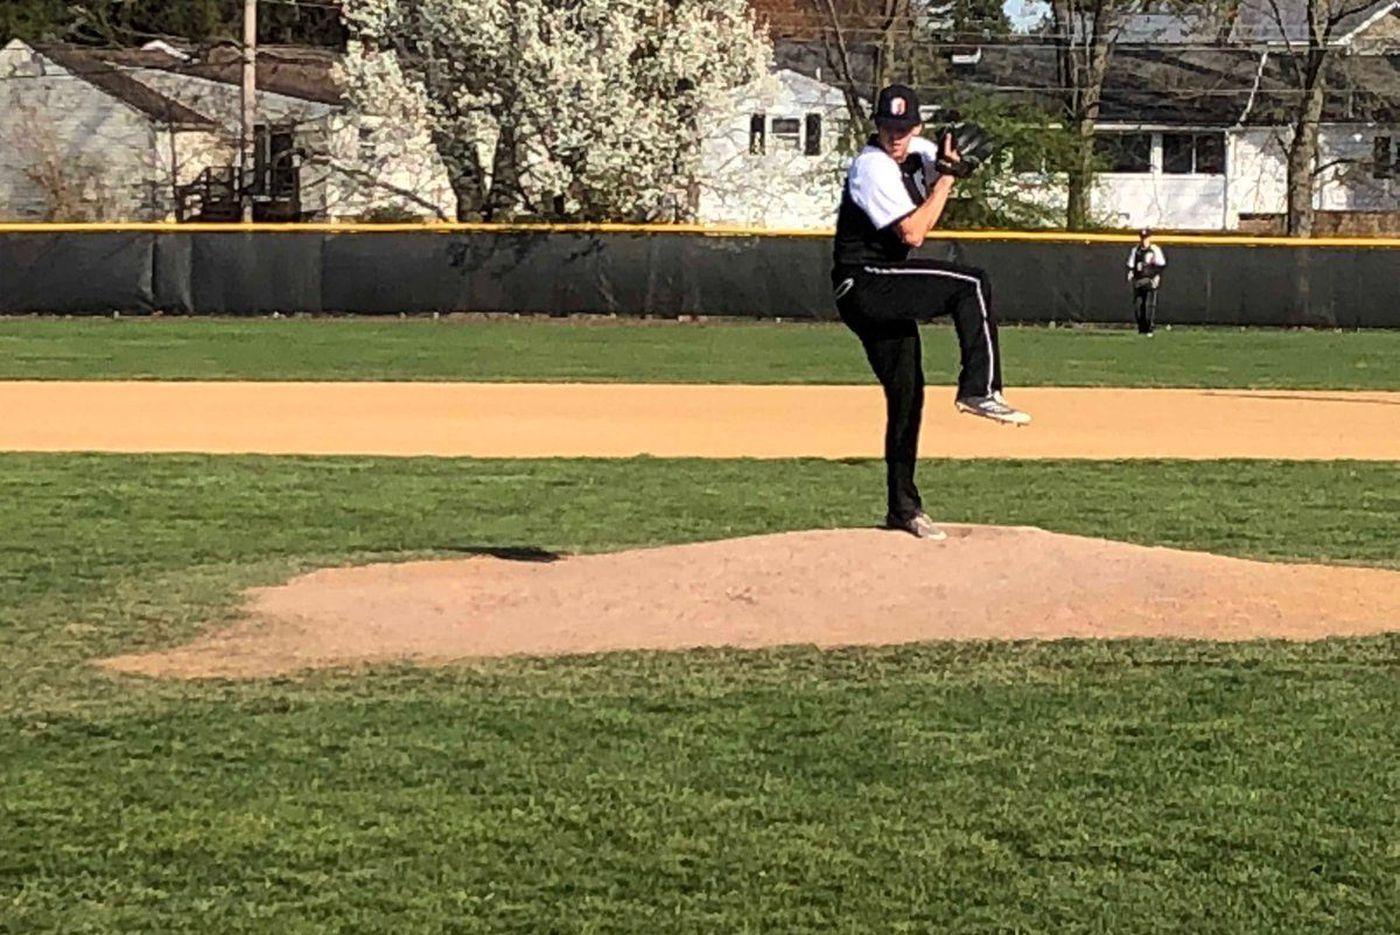 Monday's Pa. roundup: Archbishop Carroll beats Archbishop Wood in baseball